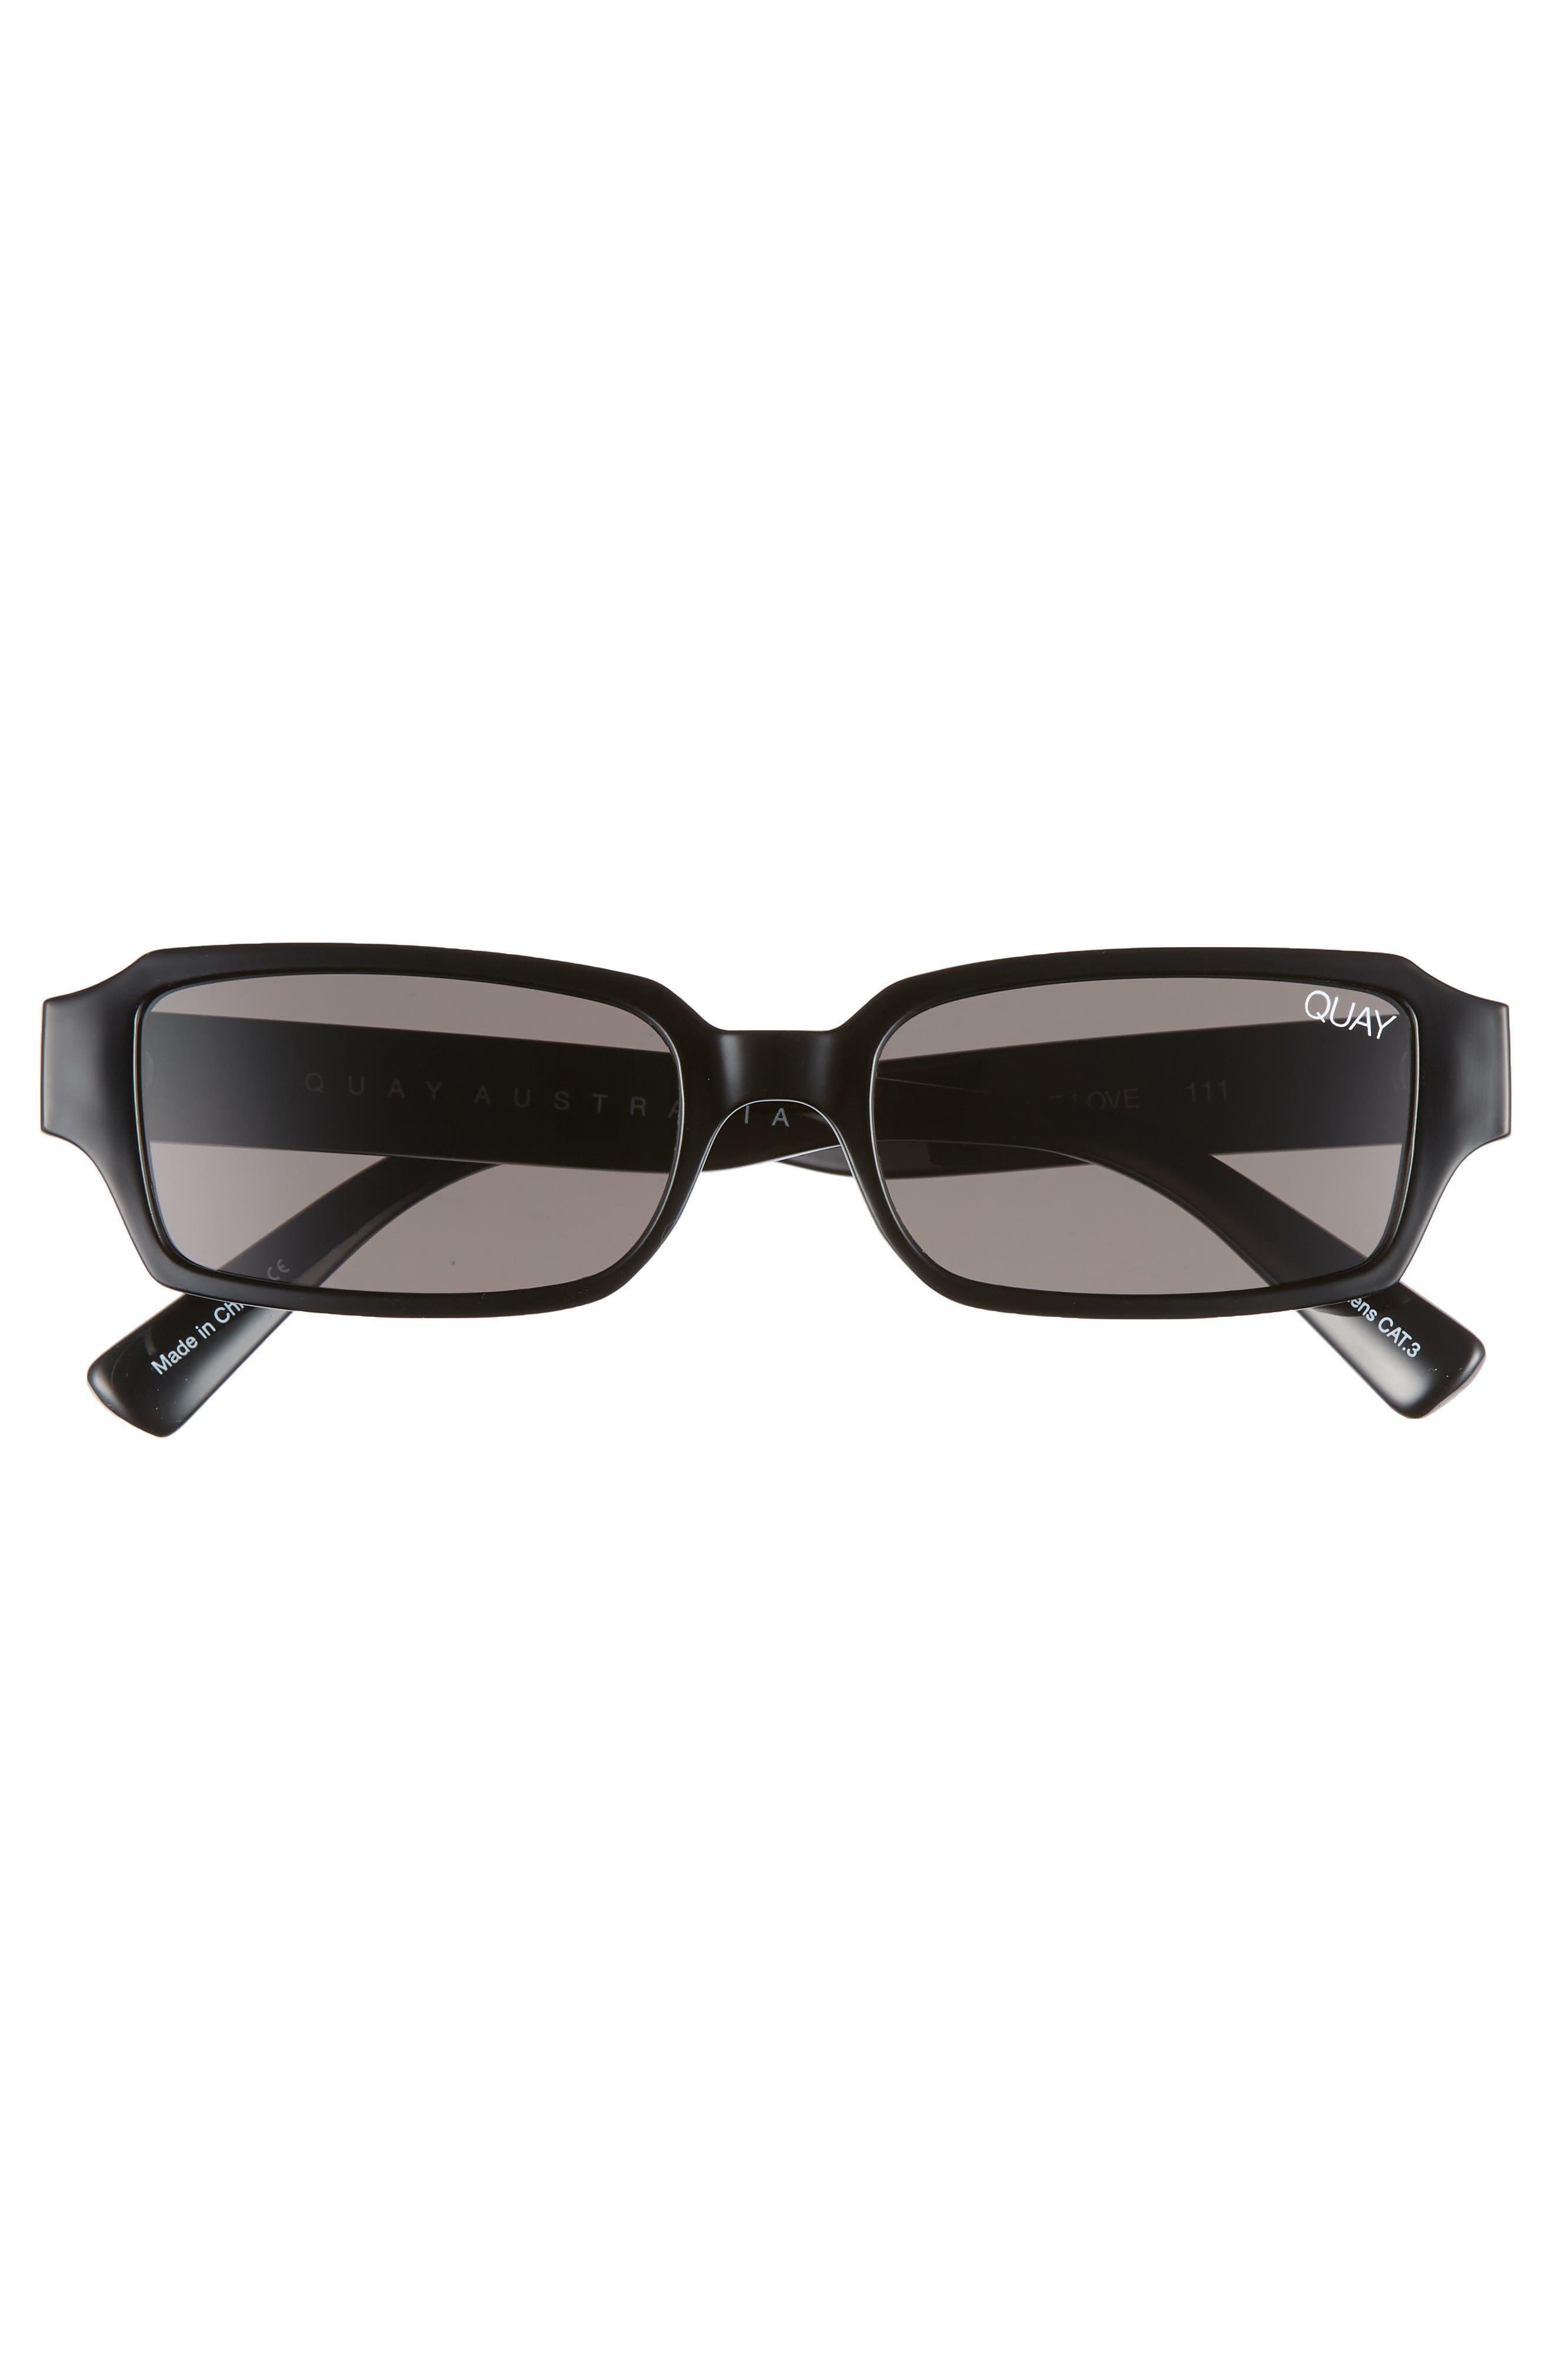 Strange Love 53mm Rectangle Sunglasses,                             Alternate thumbnail 3, color,                             BLACK/ SMOKE